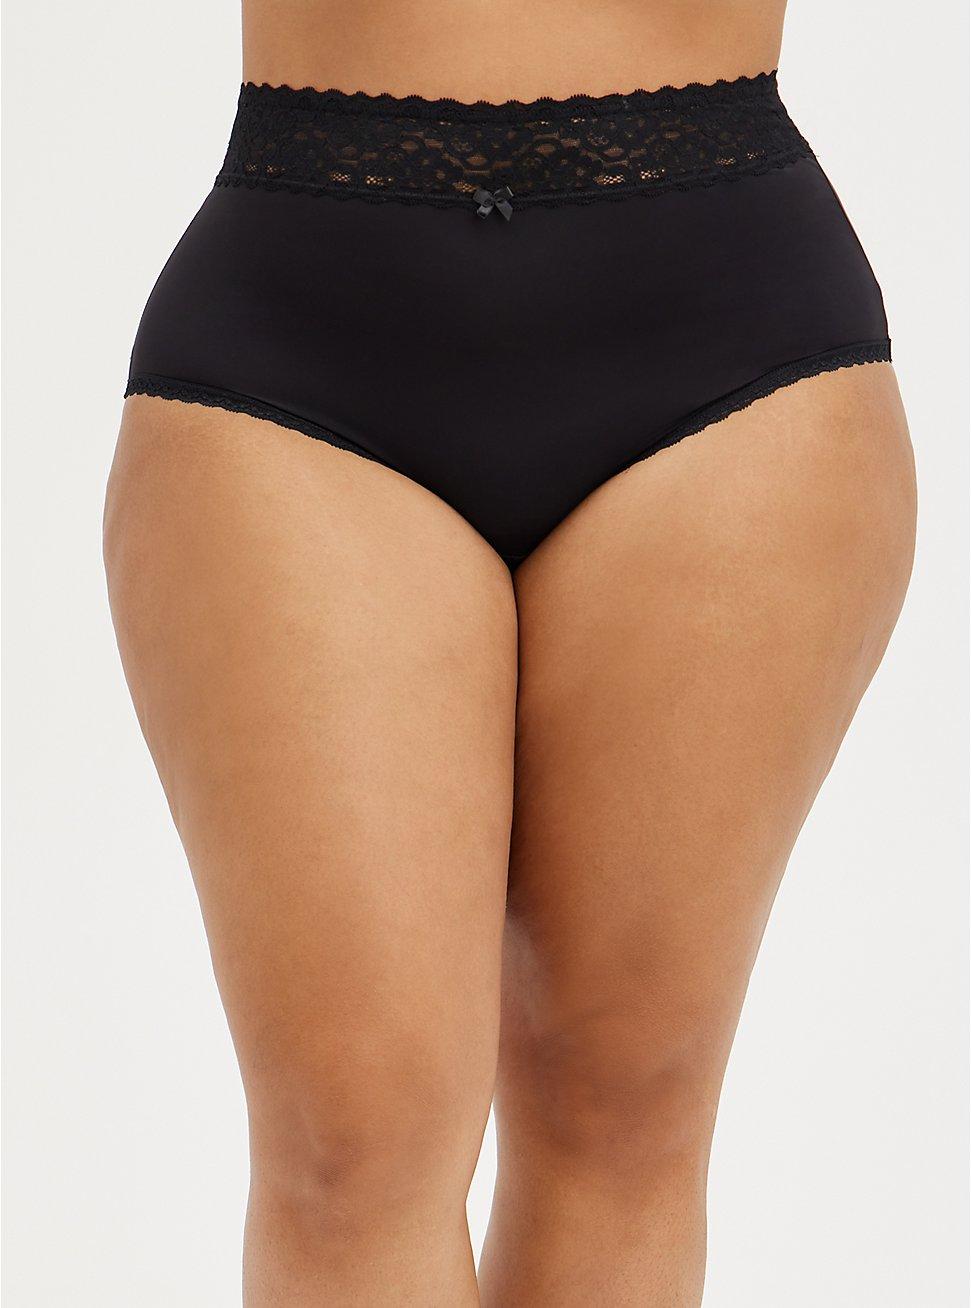 Wide Lace Trim High Waist Panty - Second Skin Black, RICH BLACK, hi-res